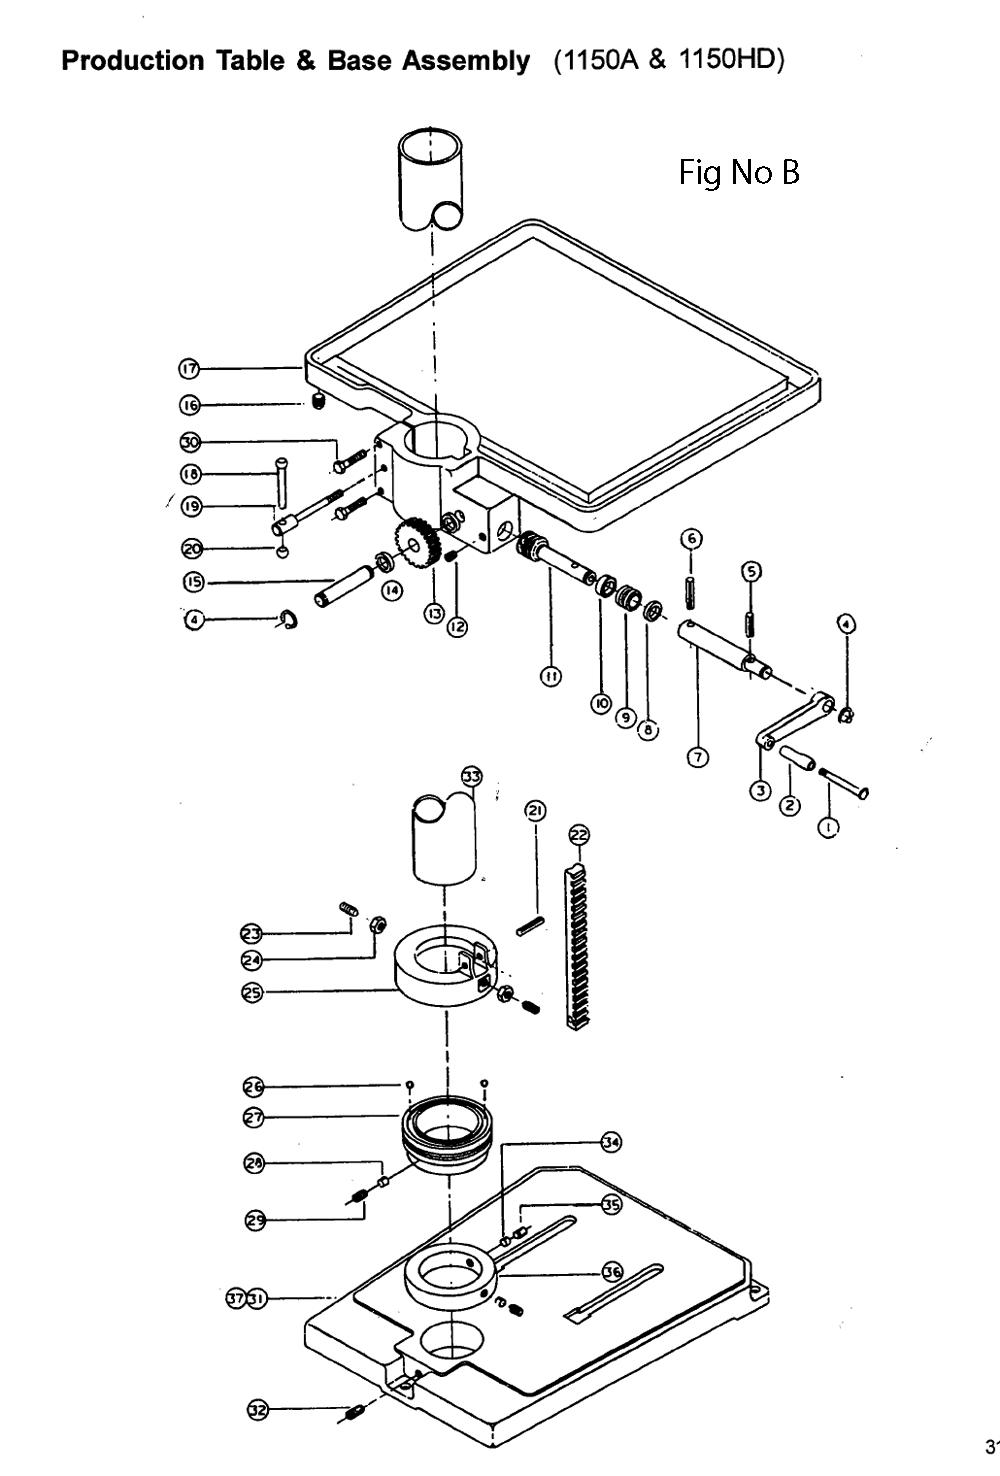 1150A-PowerMatic-PB-2Break Down